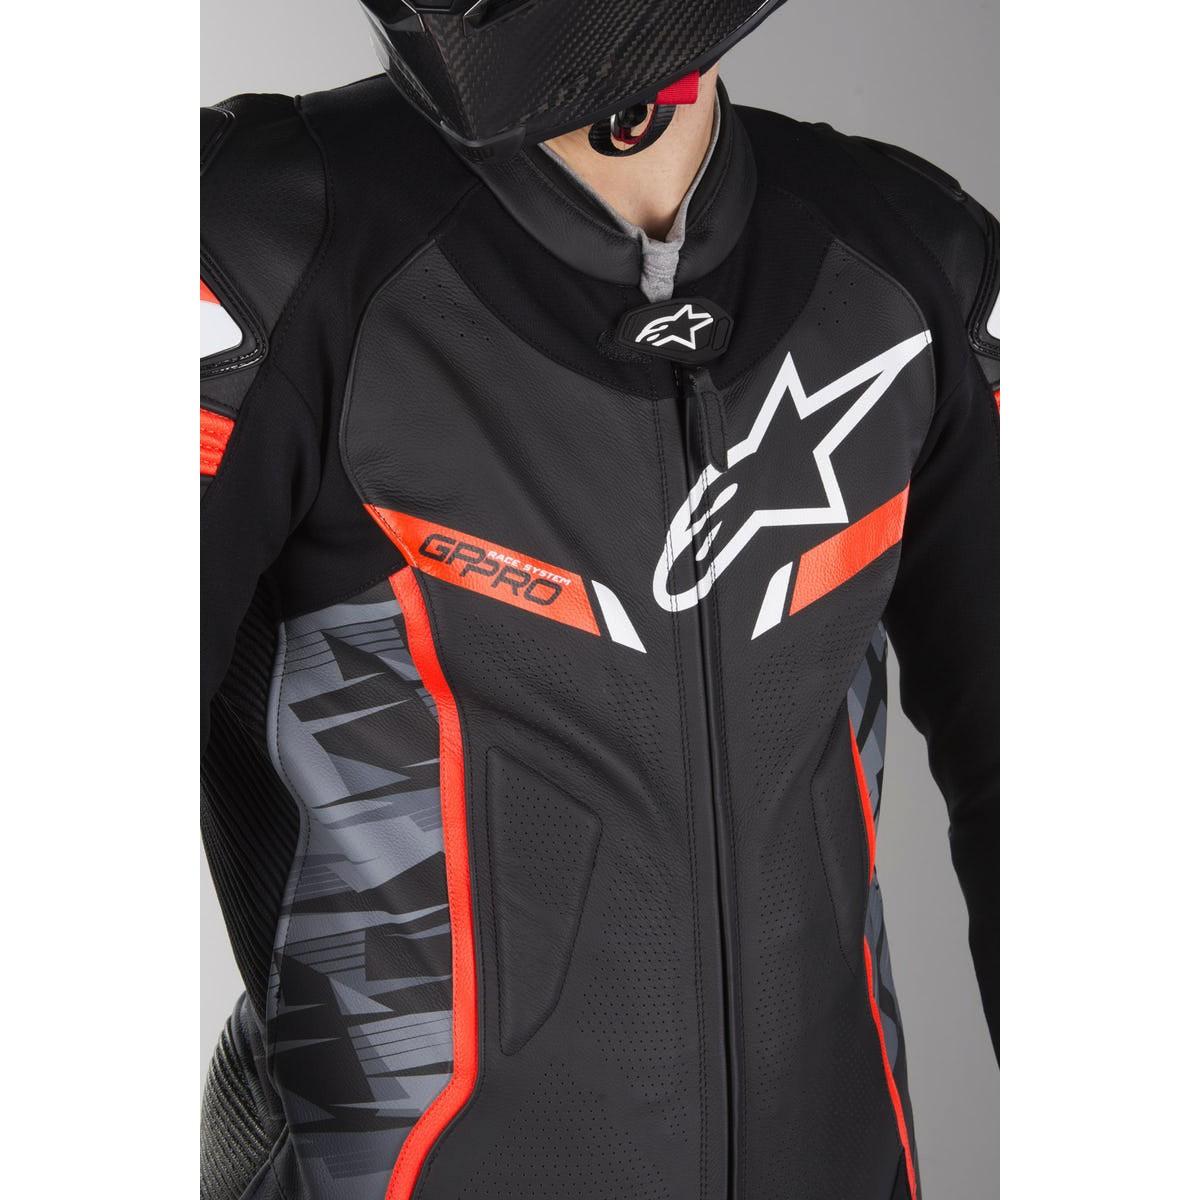 Macacão Alpinestars GP Pro V2 Tech-Air - 1 pçs - Preto/Camo/Vermelho  - Super Bike - Loja Oficial Alpinestars